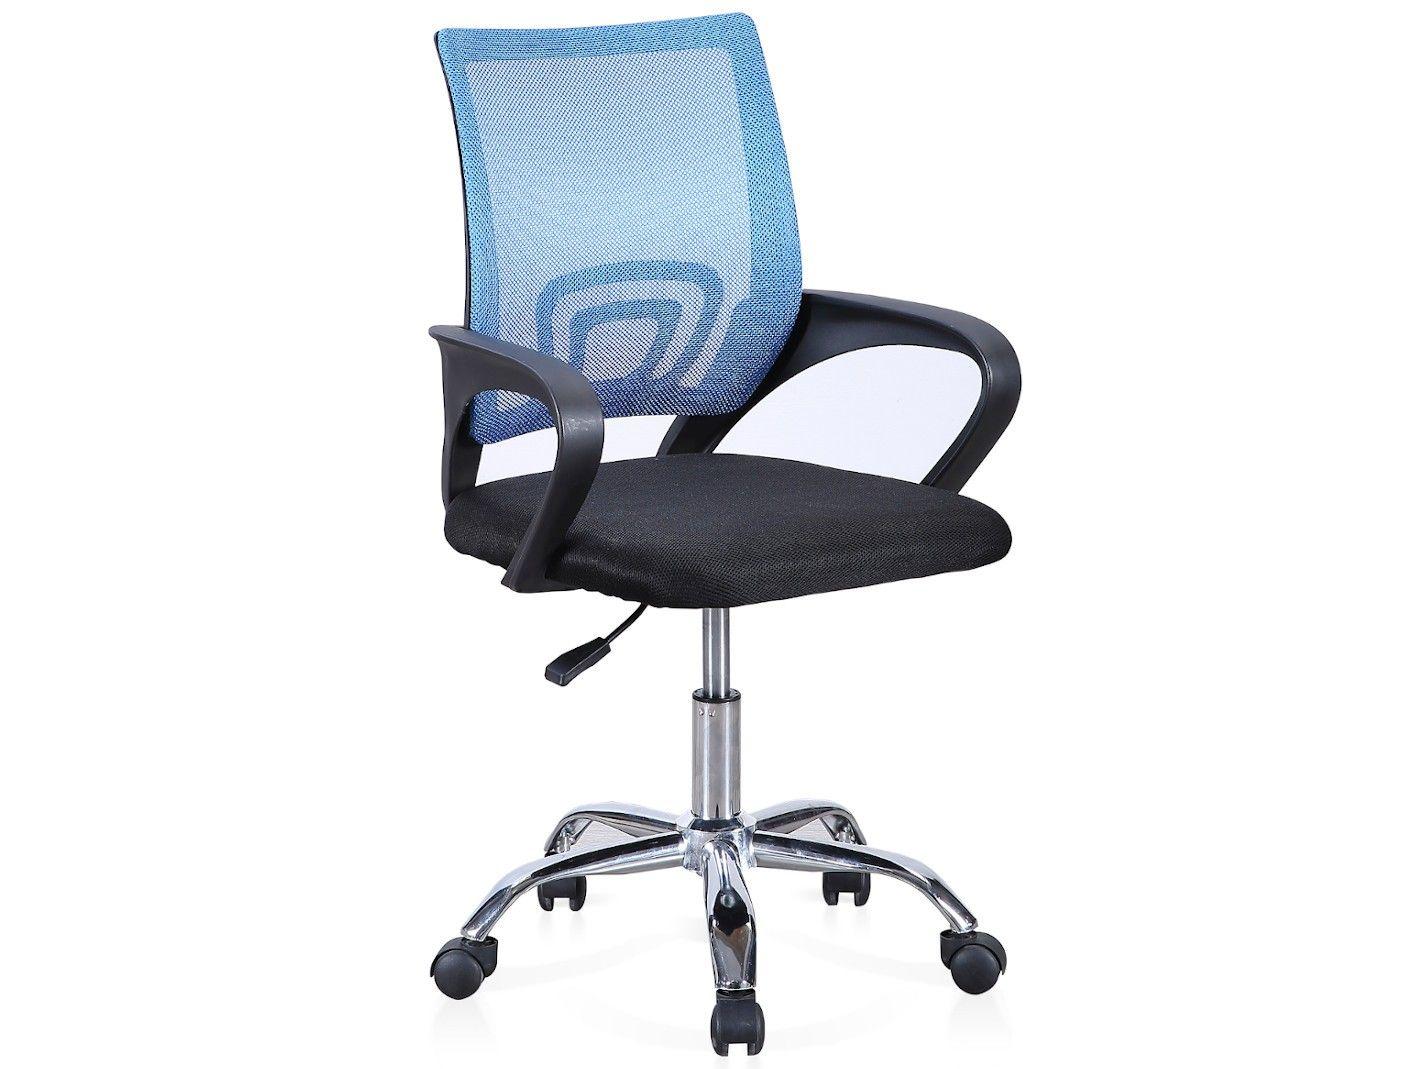 dimensiones sofa chaise longue latest madonna sofa left arm with dimensiones sofa chaise longue. Black Bedroom Furniture Sets. Home Design Ideas